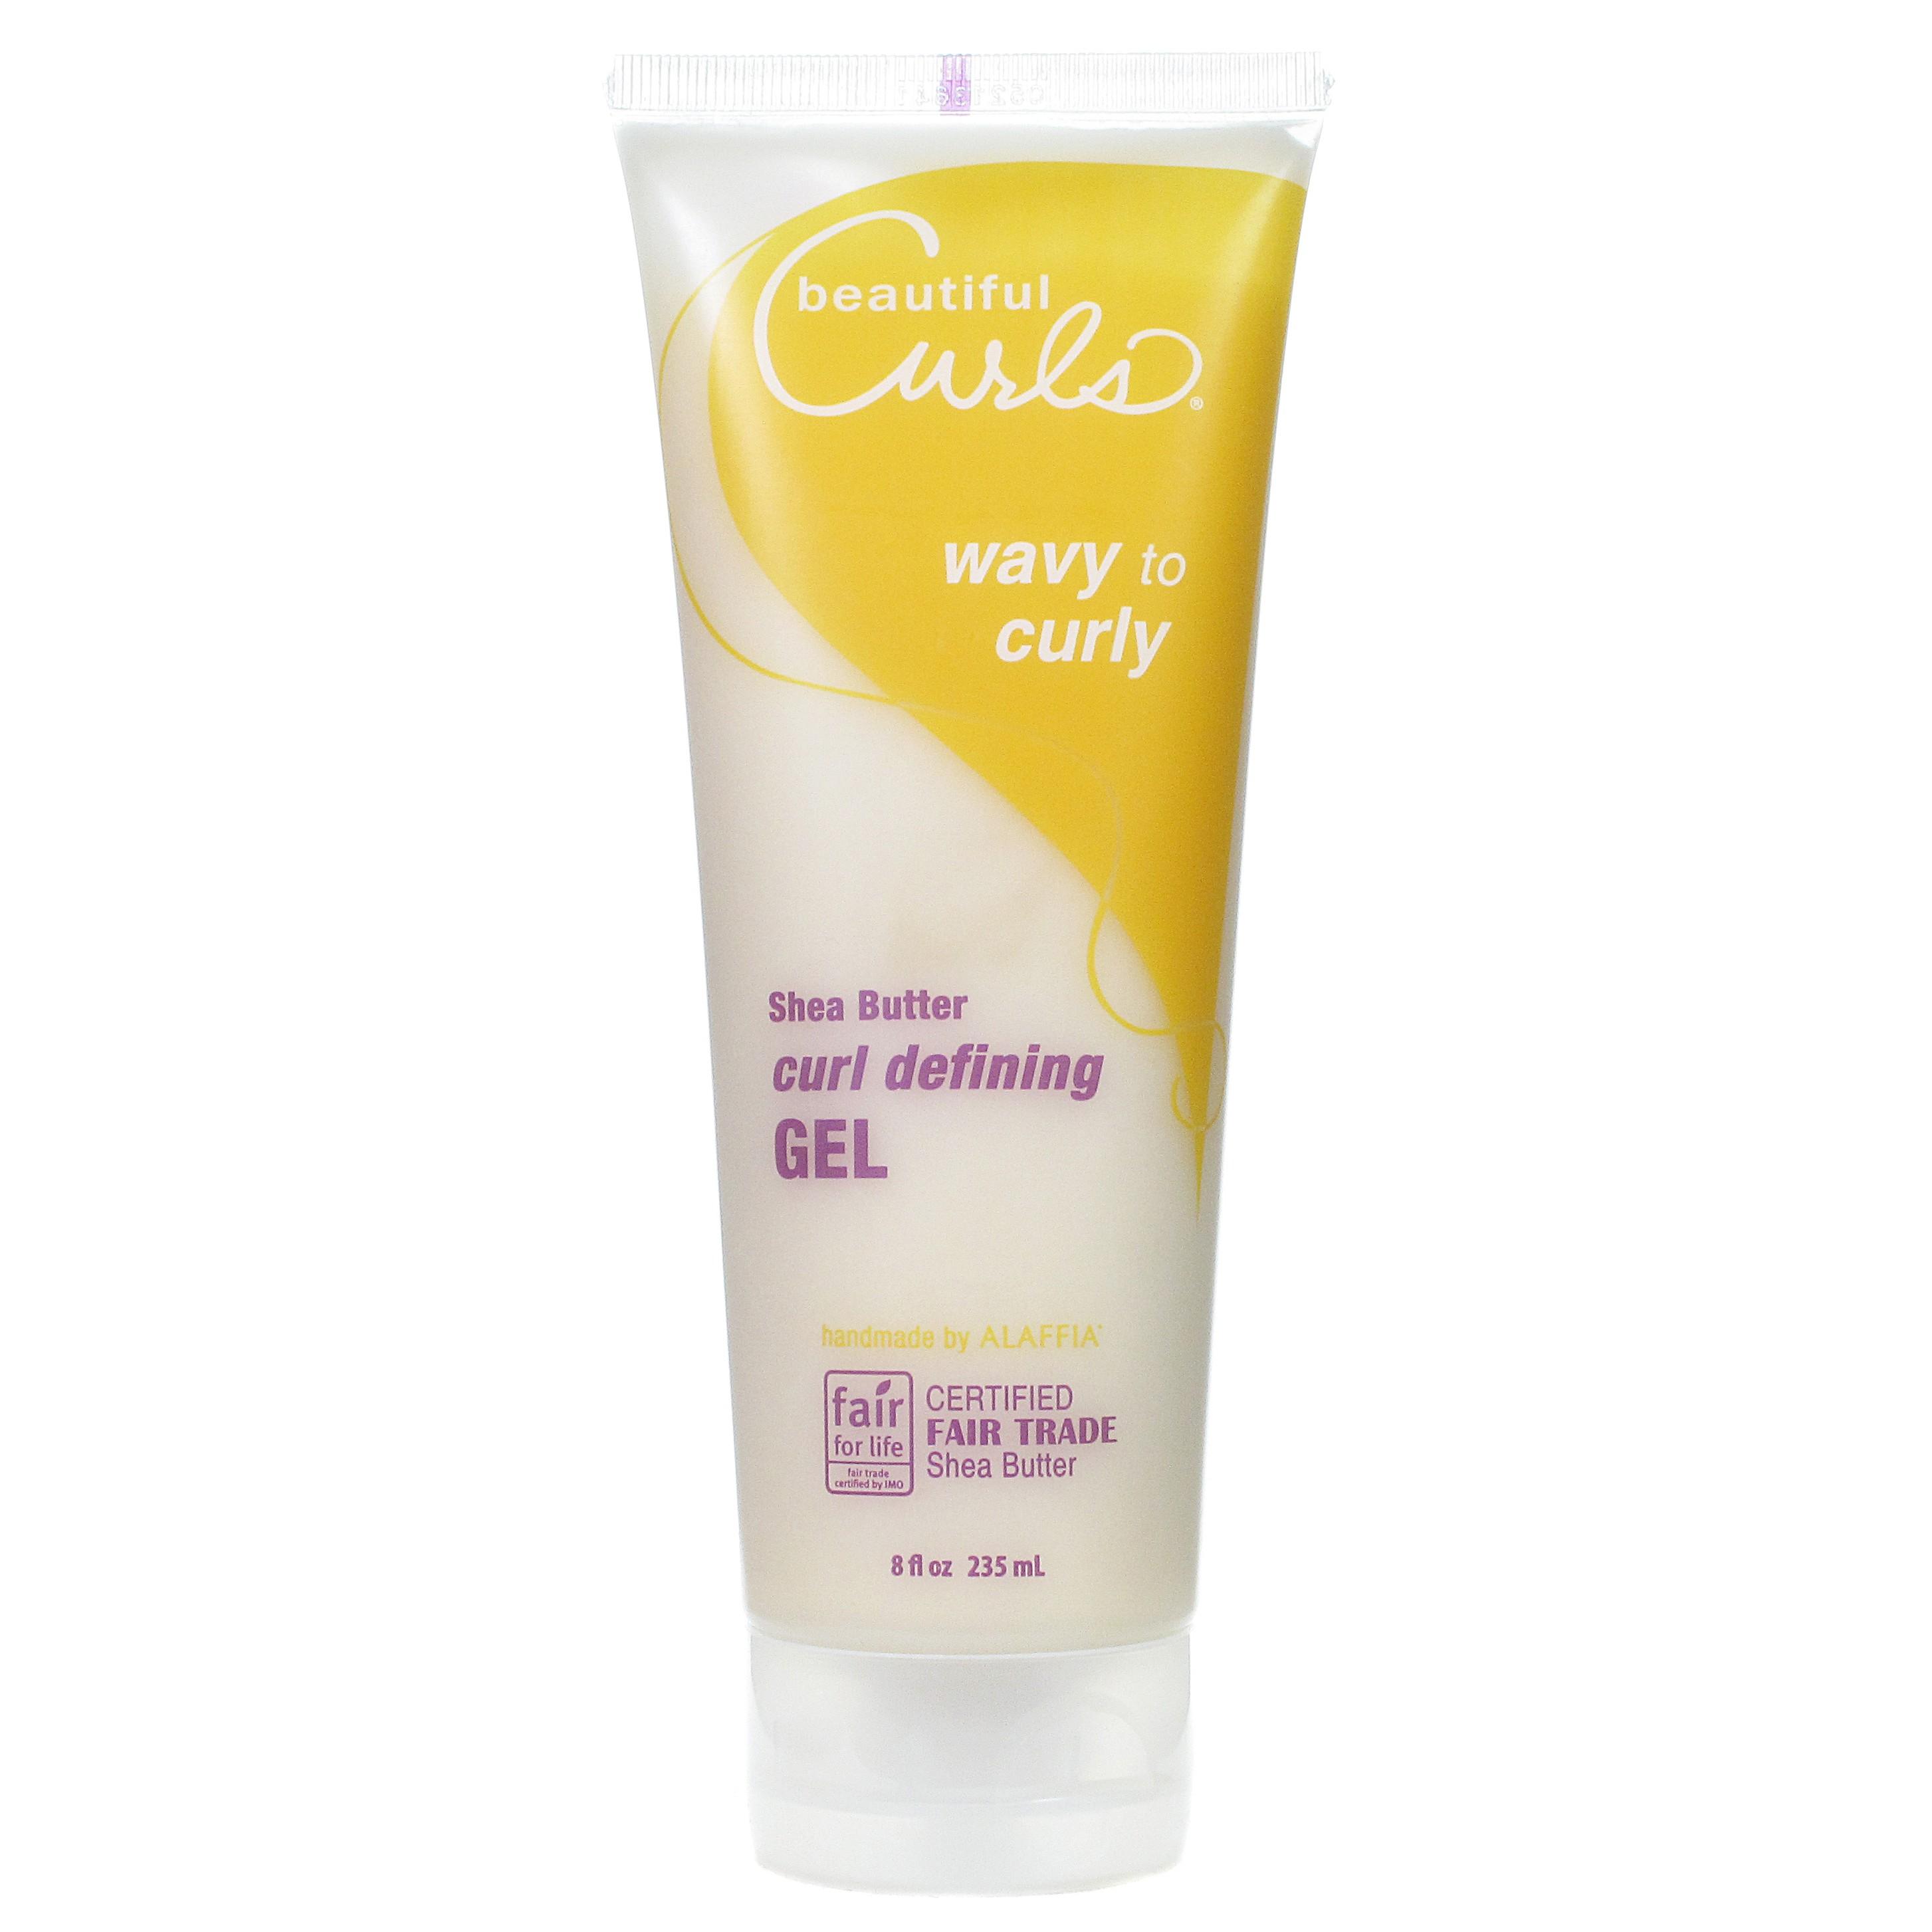 Review Beautiful Curls by Alaffia Shea Butter Curl Defining Gel ...